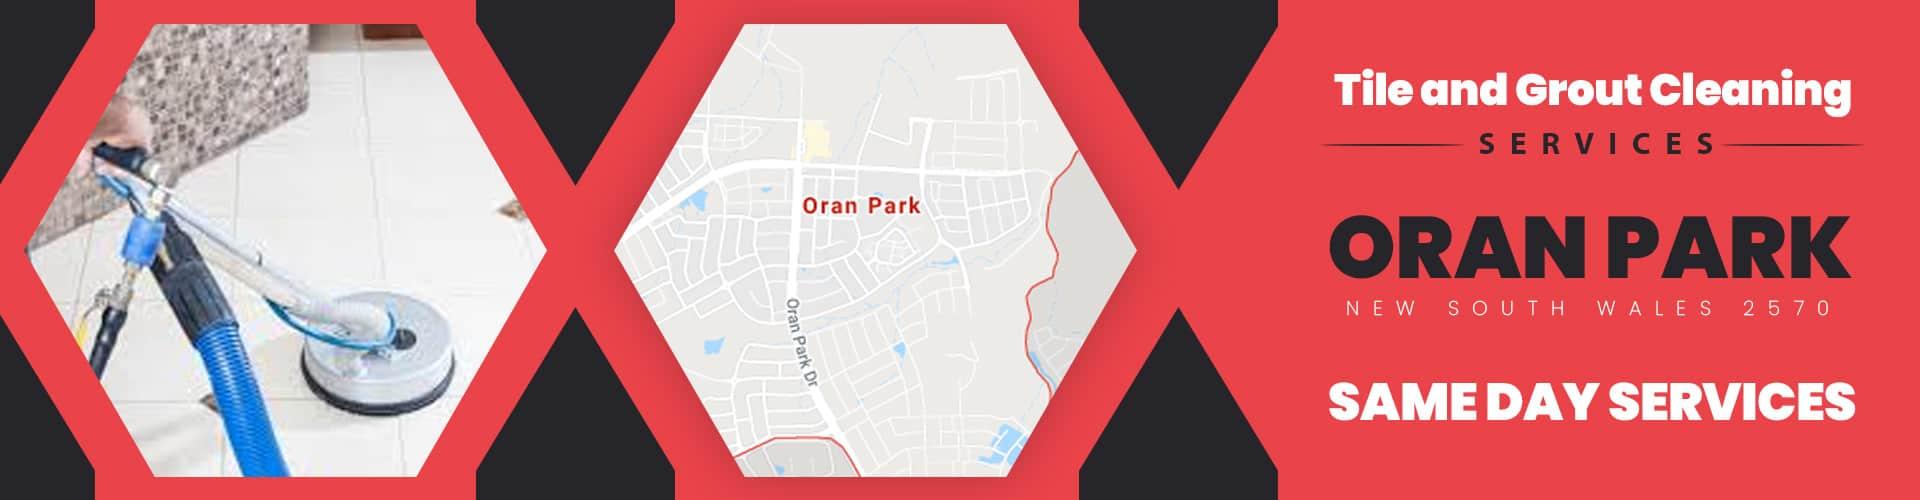 Tile Grout Cleaning Services Oran Park